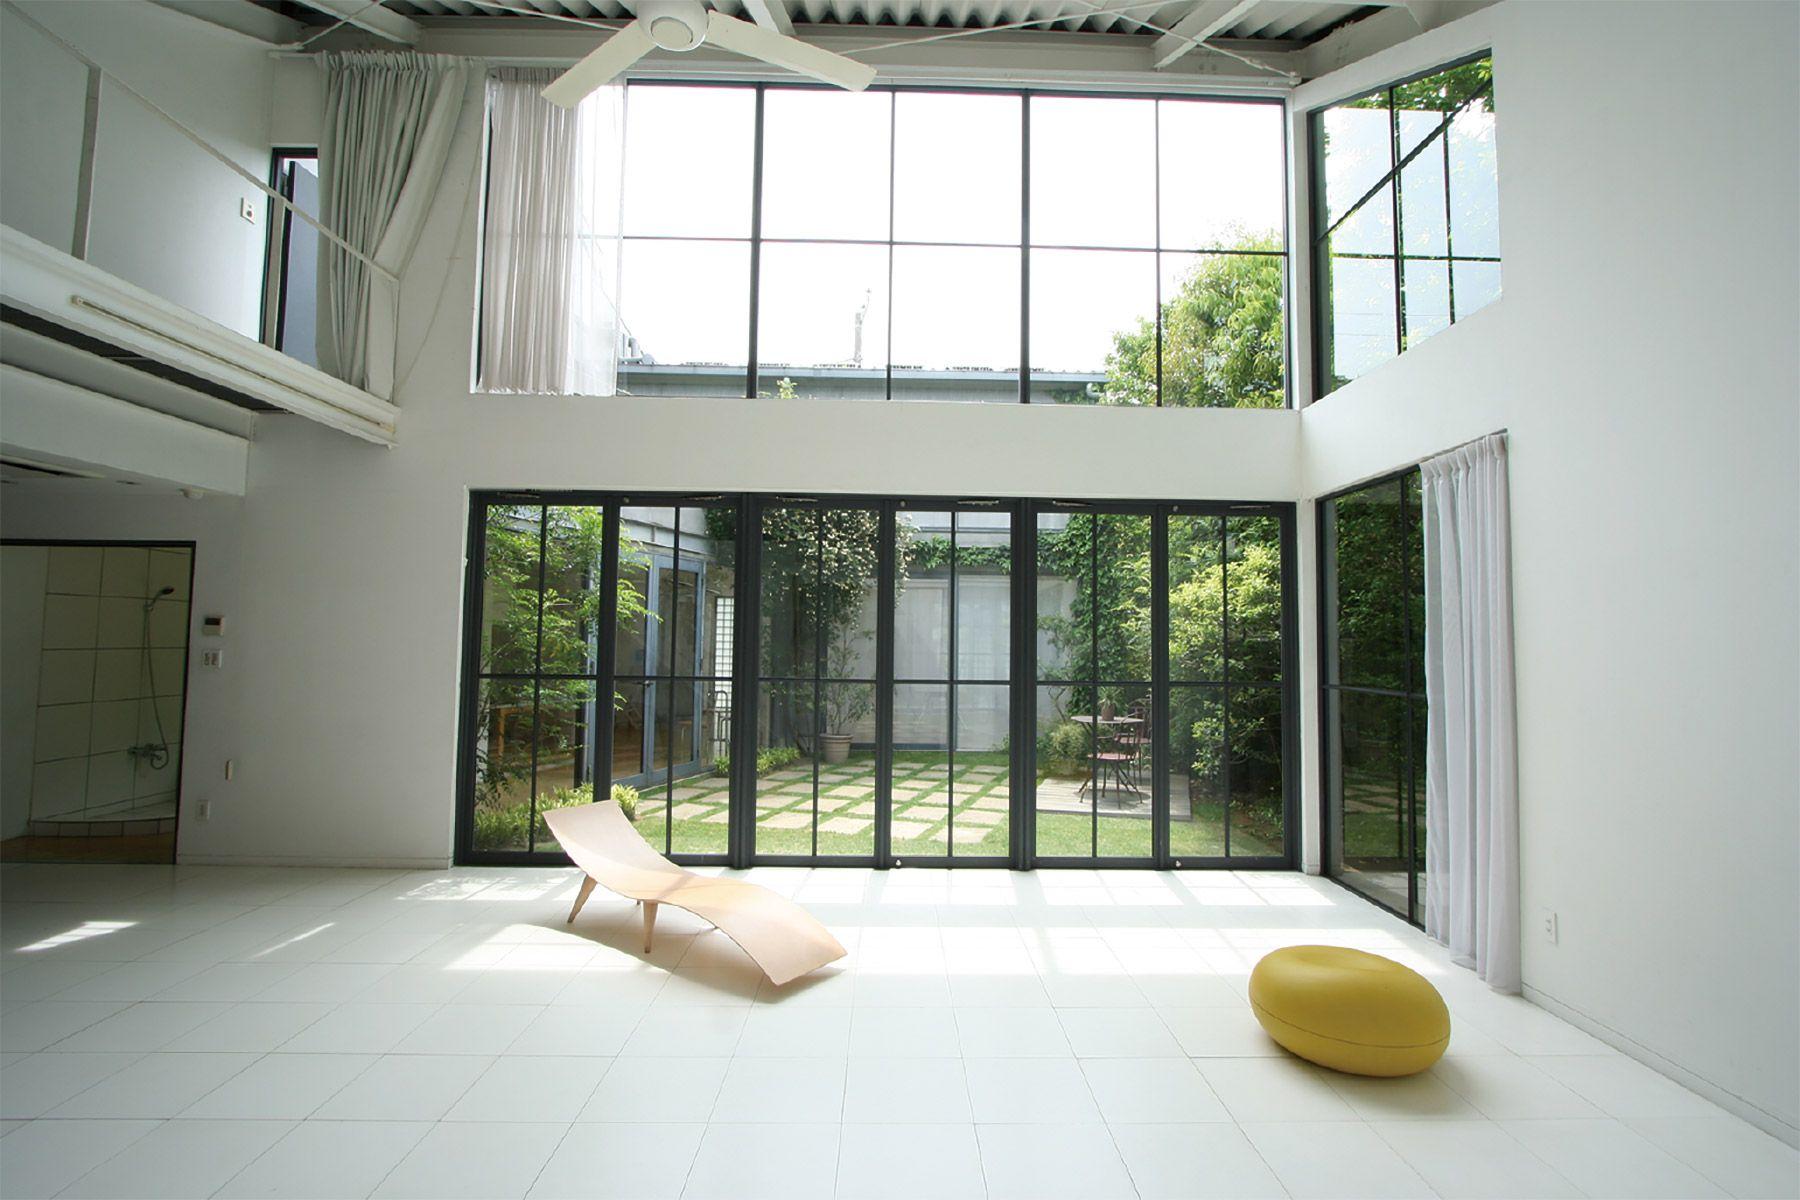 LIGHT BOX STUDIO 中野 Ast (ライトボックススタジオ)A-3 光が射し込む南窓は高さ5m